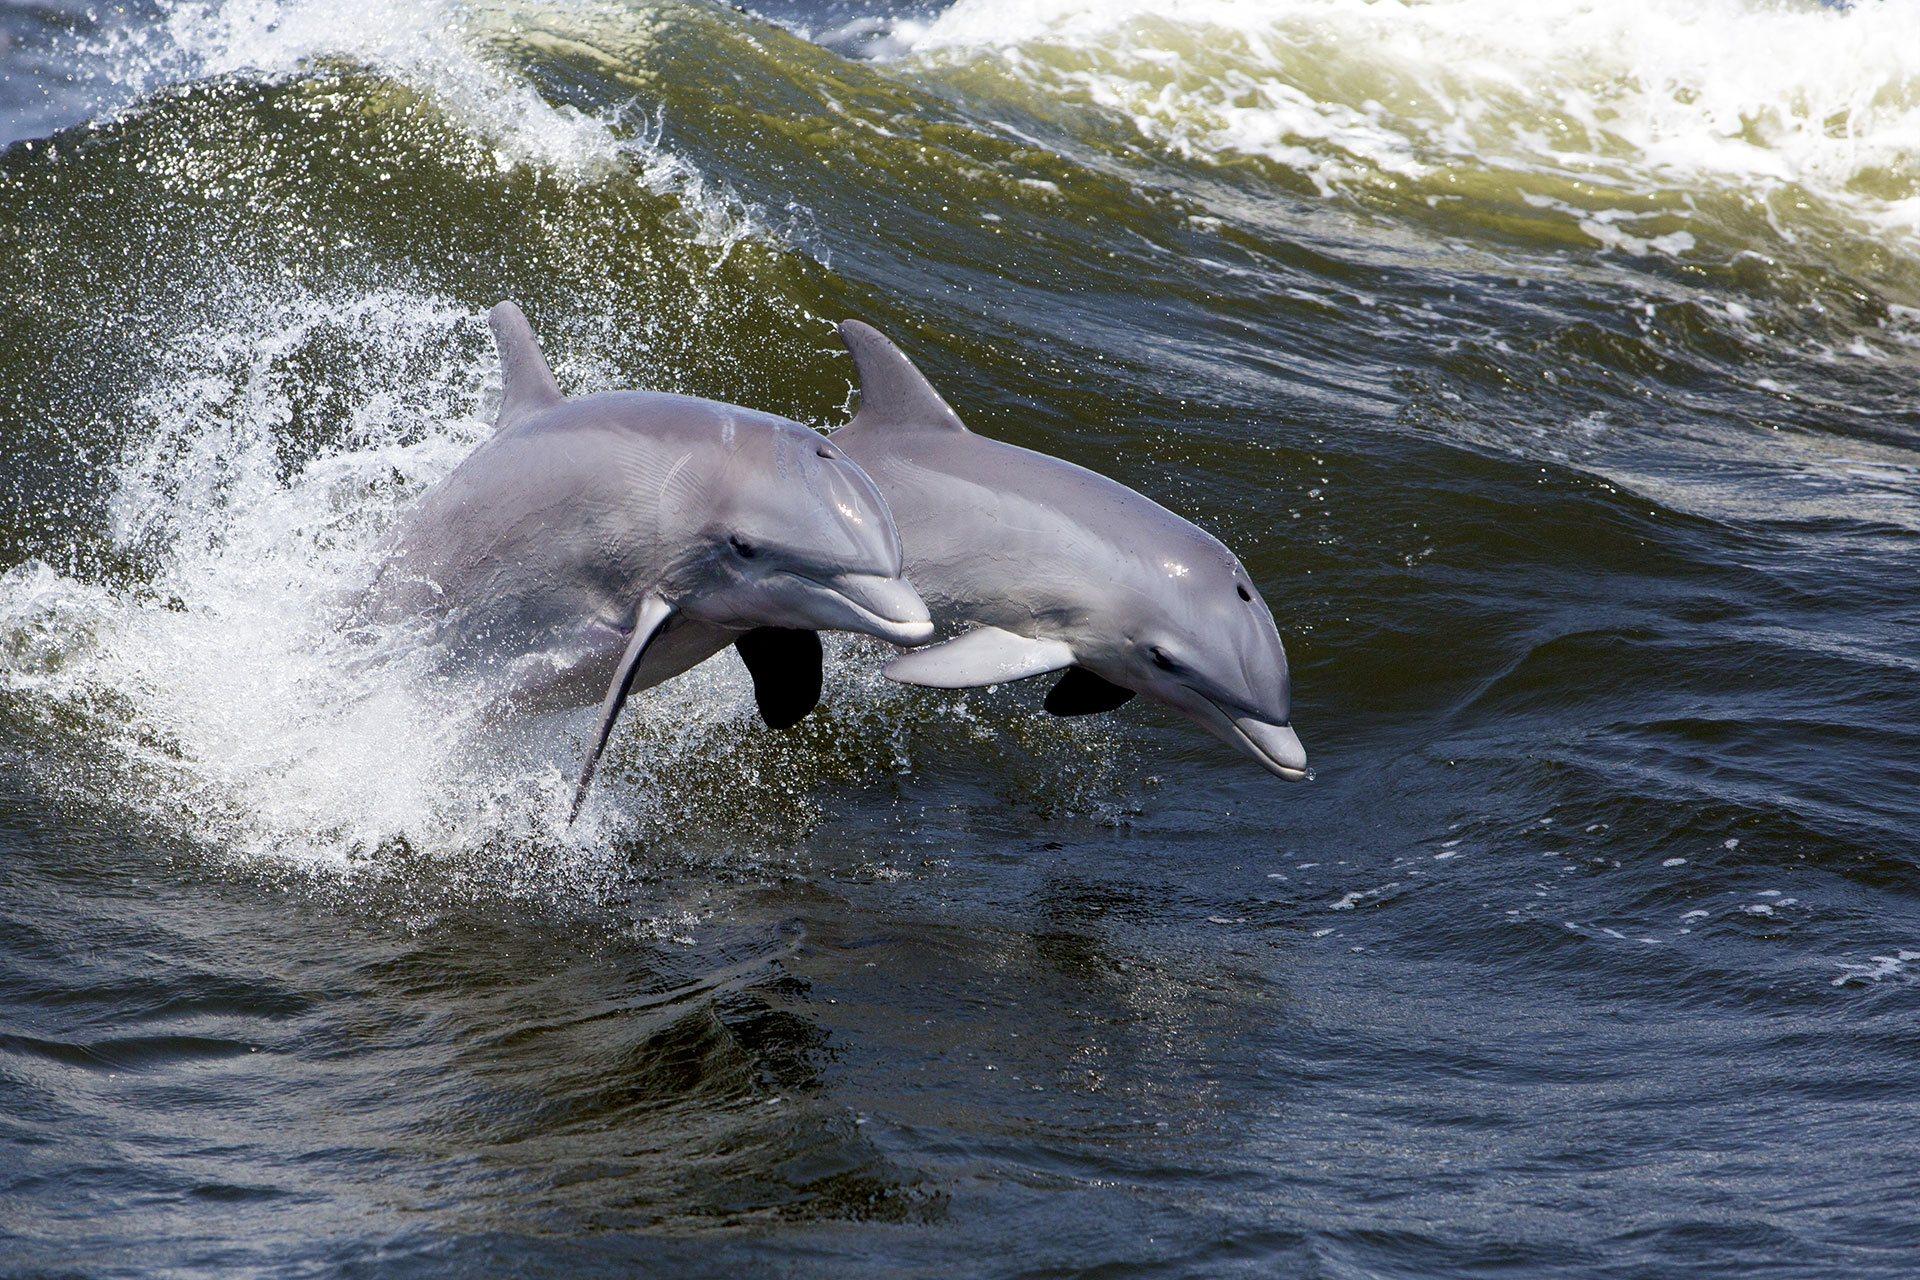 Dolphin Cruise - Bottlenose